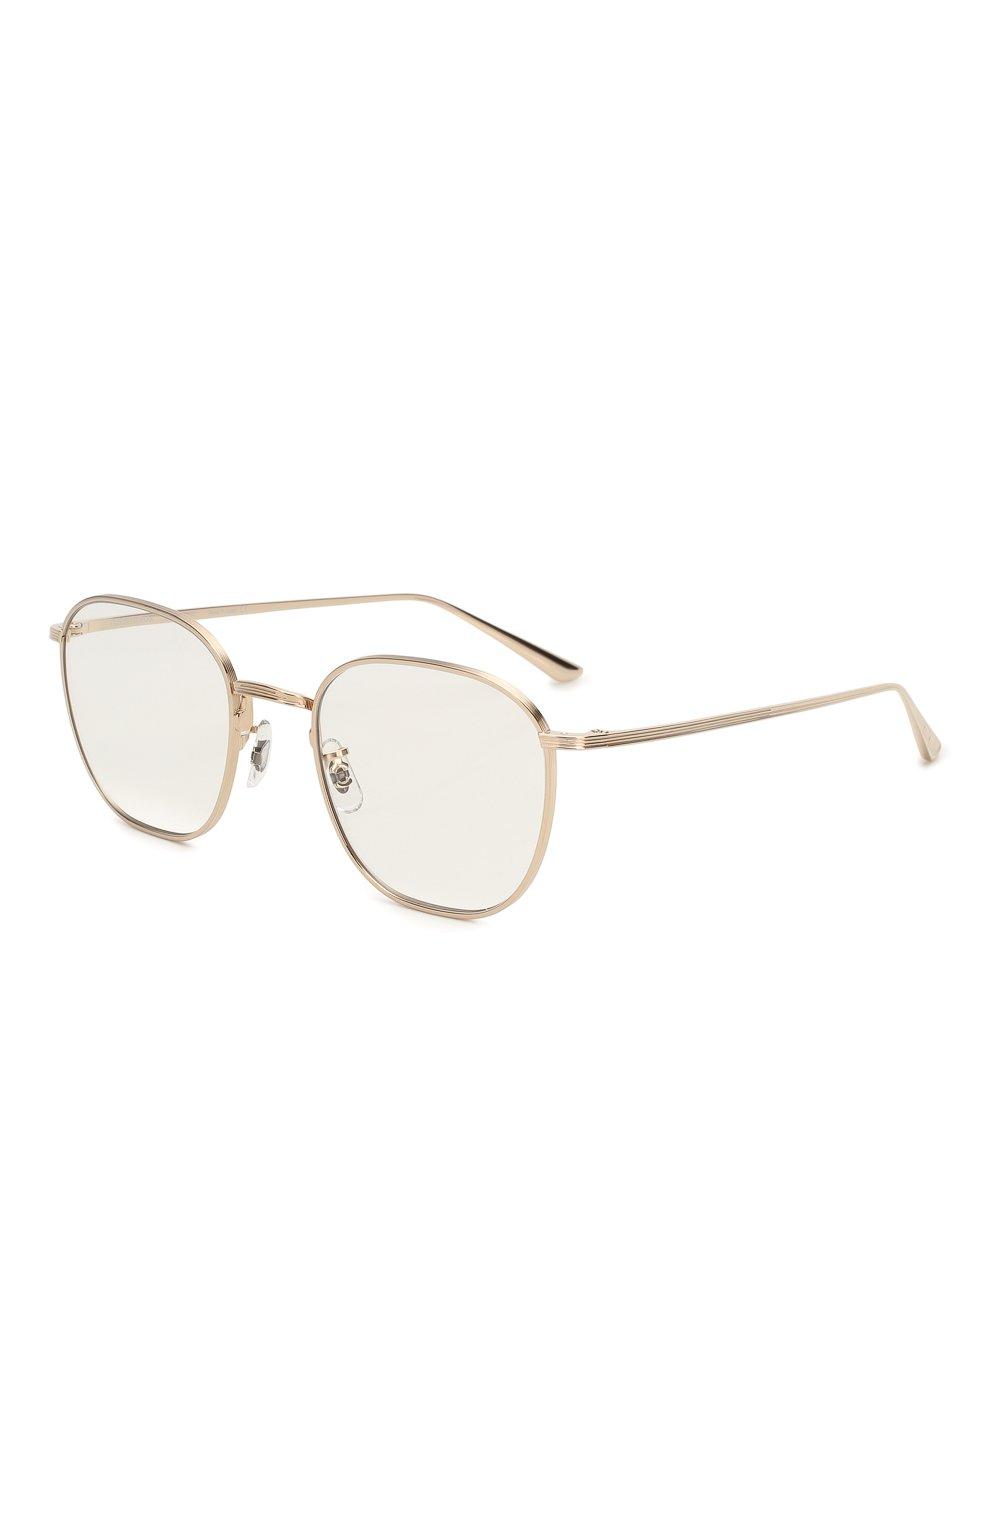 Женские солнцезащитные очки THE ROW X OLIVER PEOPLES золотого цвета, арт. 1230ST-52921W   Фото 1 (Тип очков: С/з; Очки форма: Круглые; Оптика Гендер: оптика-унисекс)